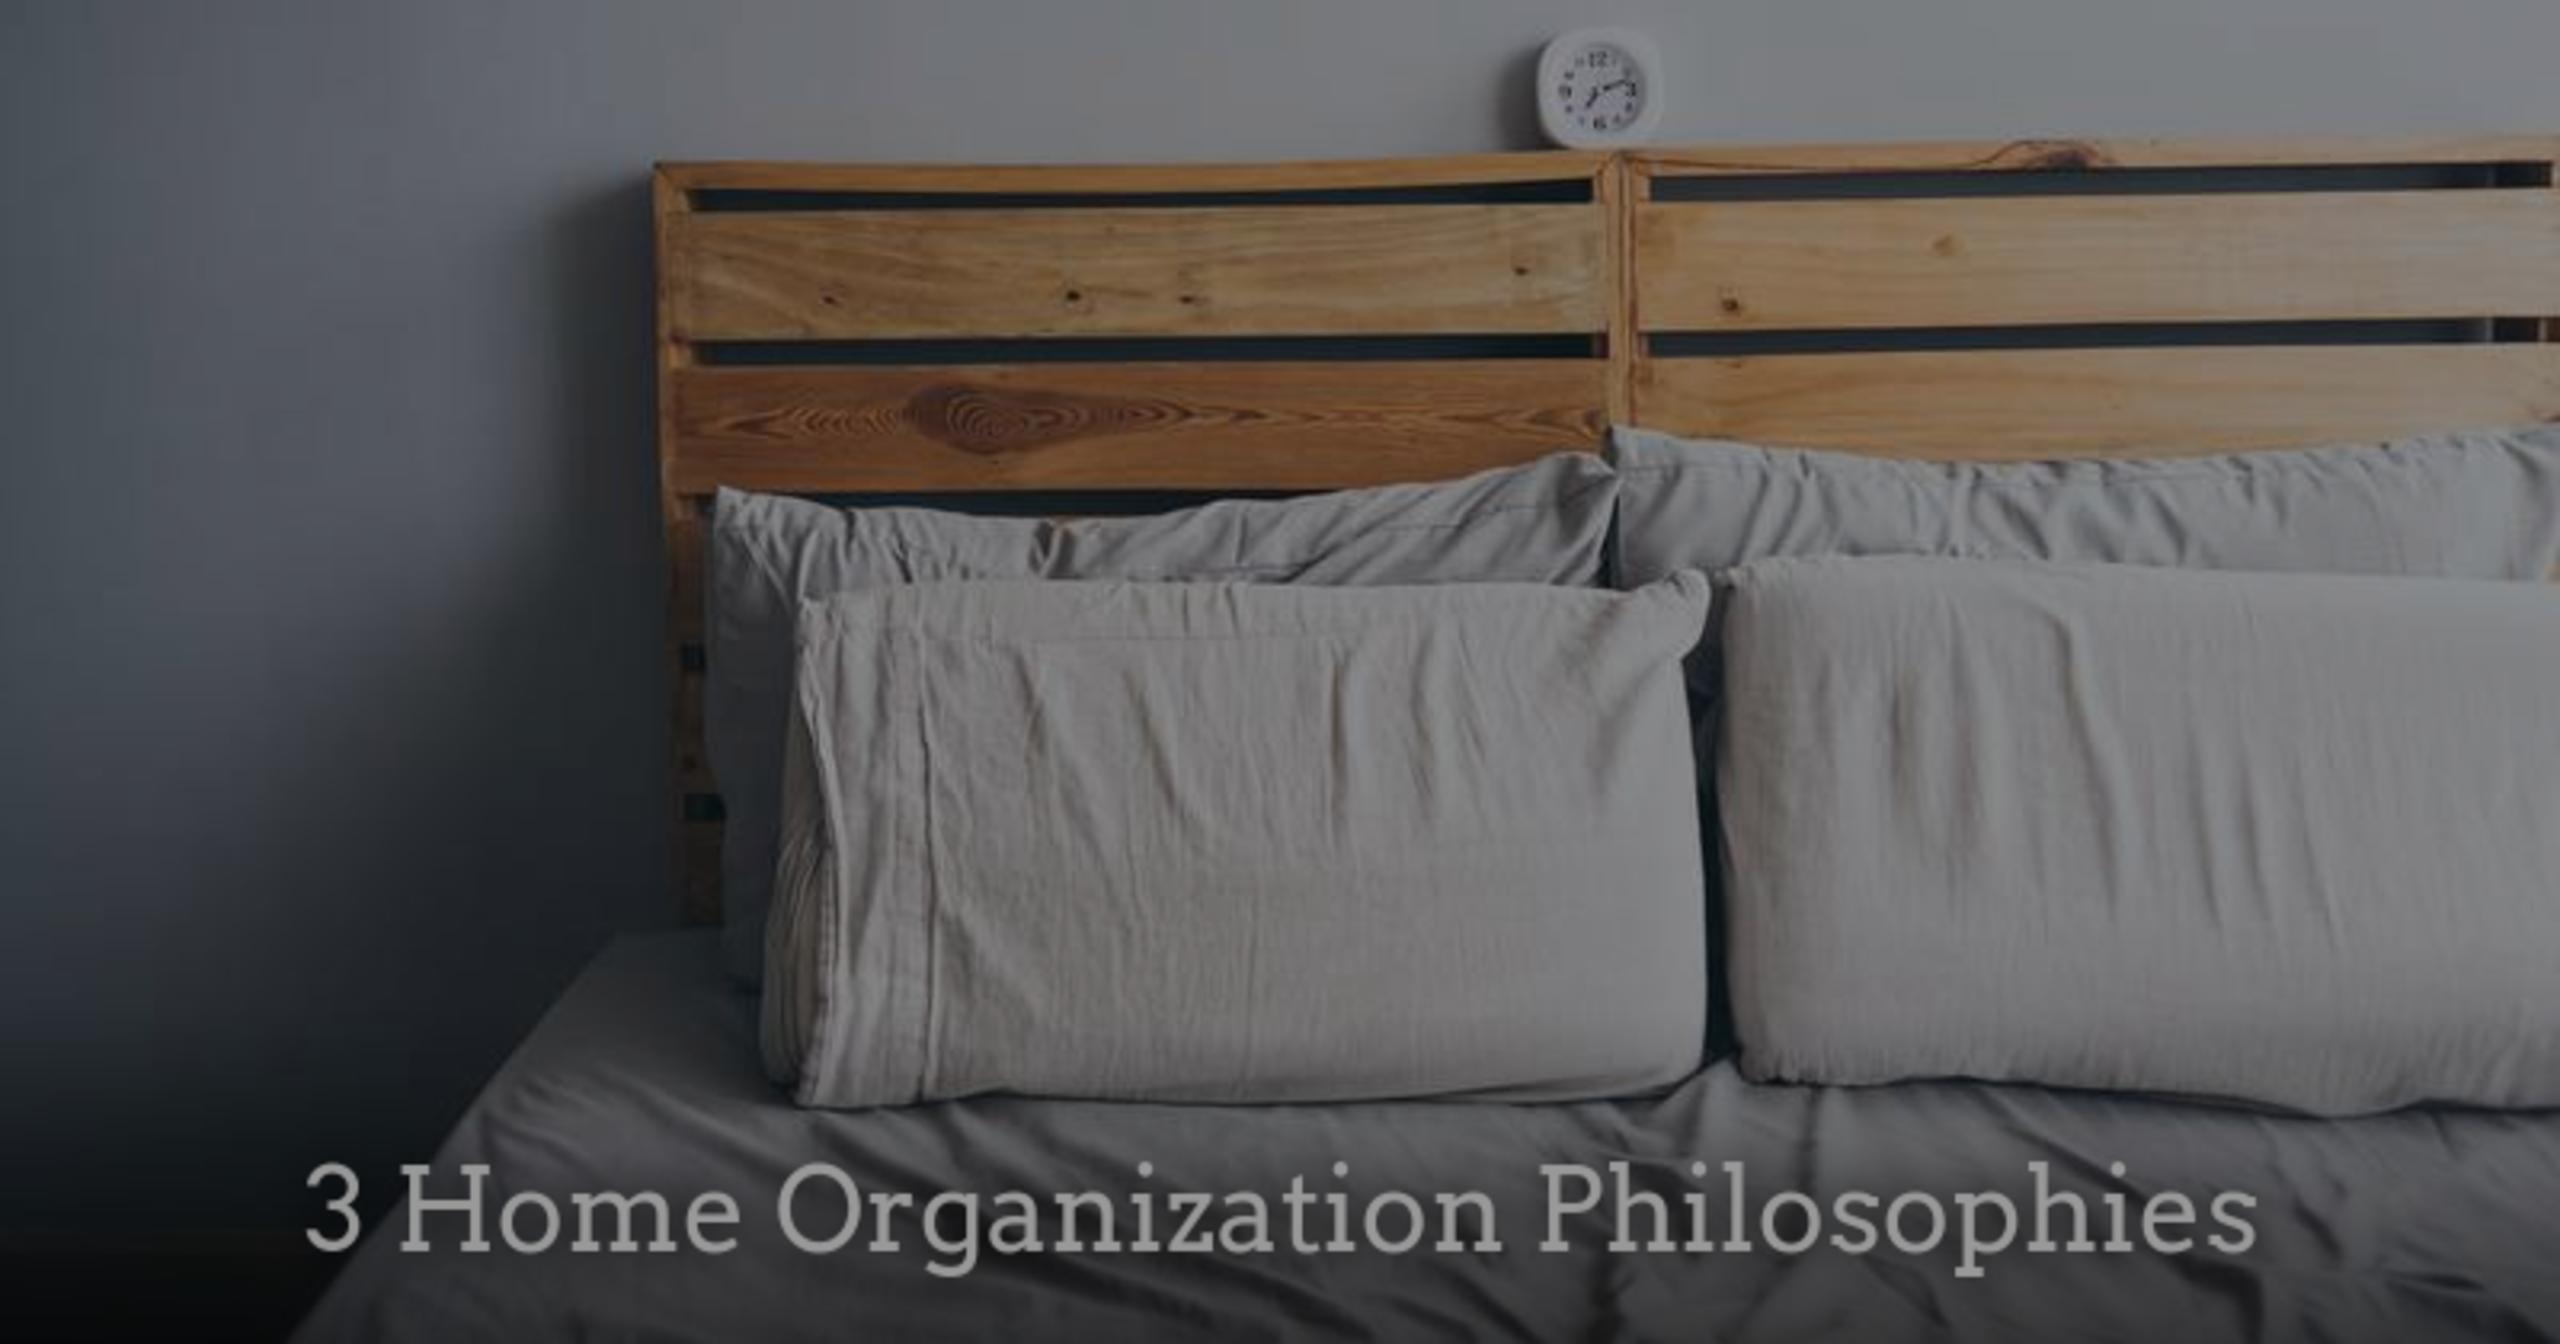 3 Home Organization Philosophies